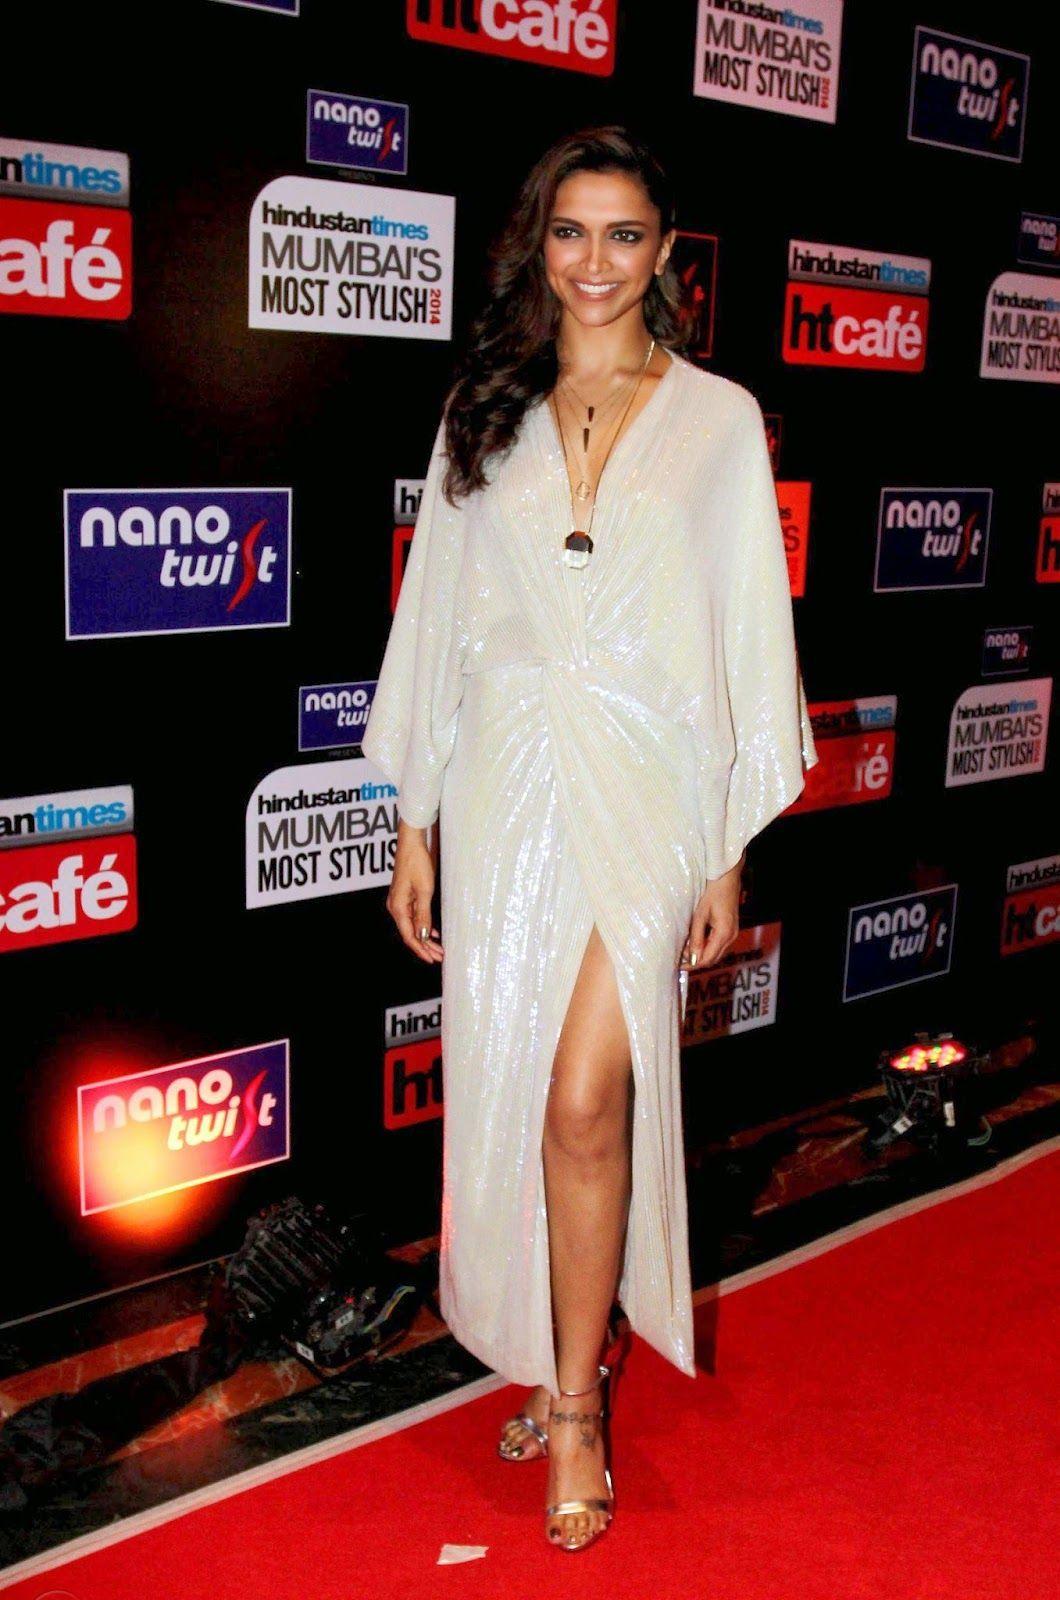 Deepika Padukone Showcasing Her Sexy Cleavage And Legs